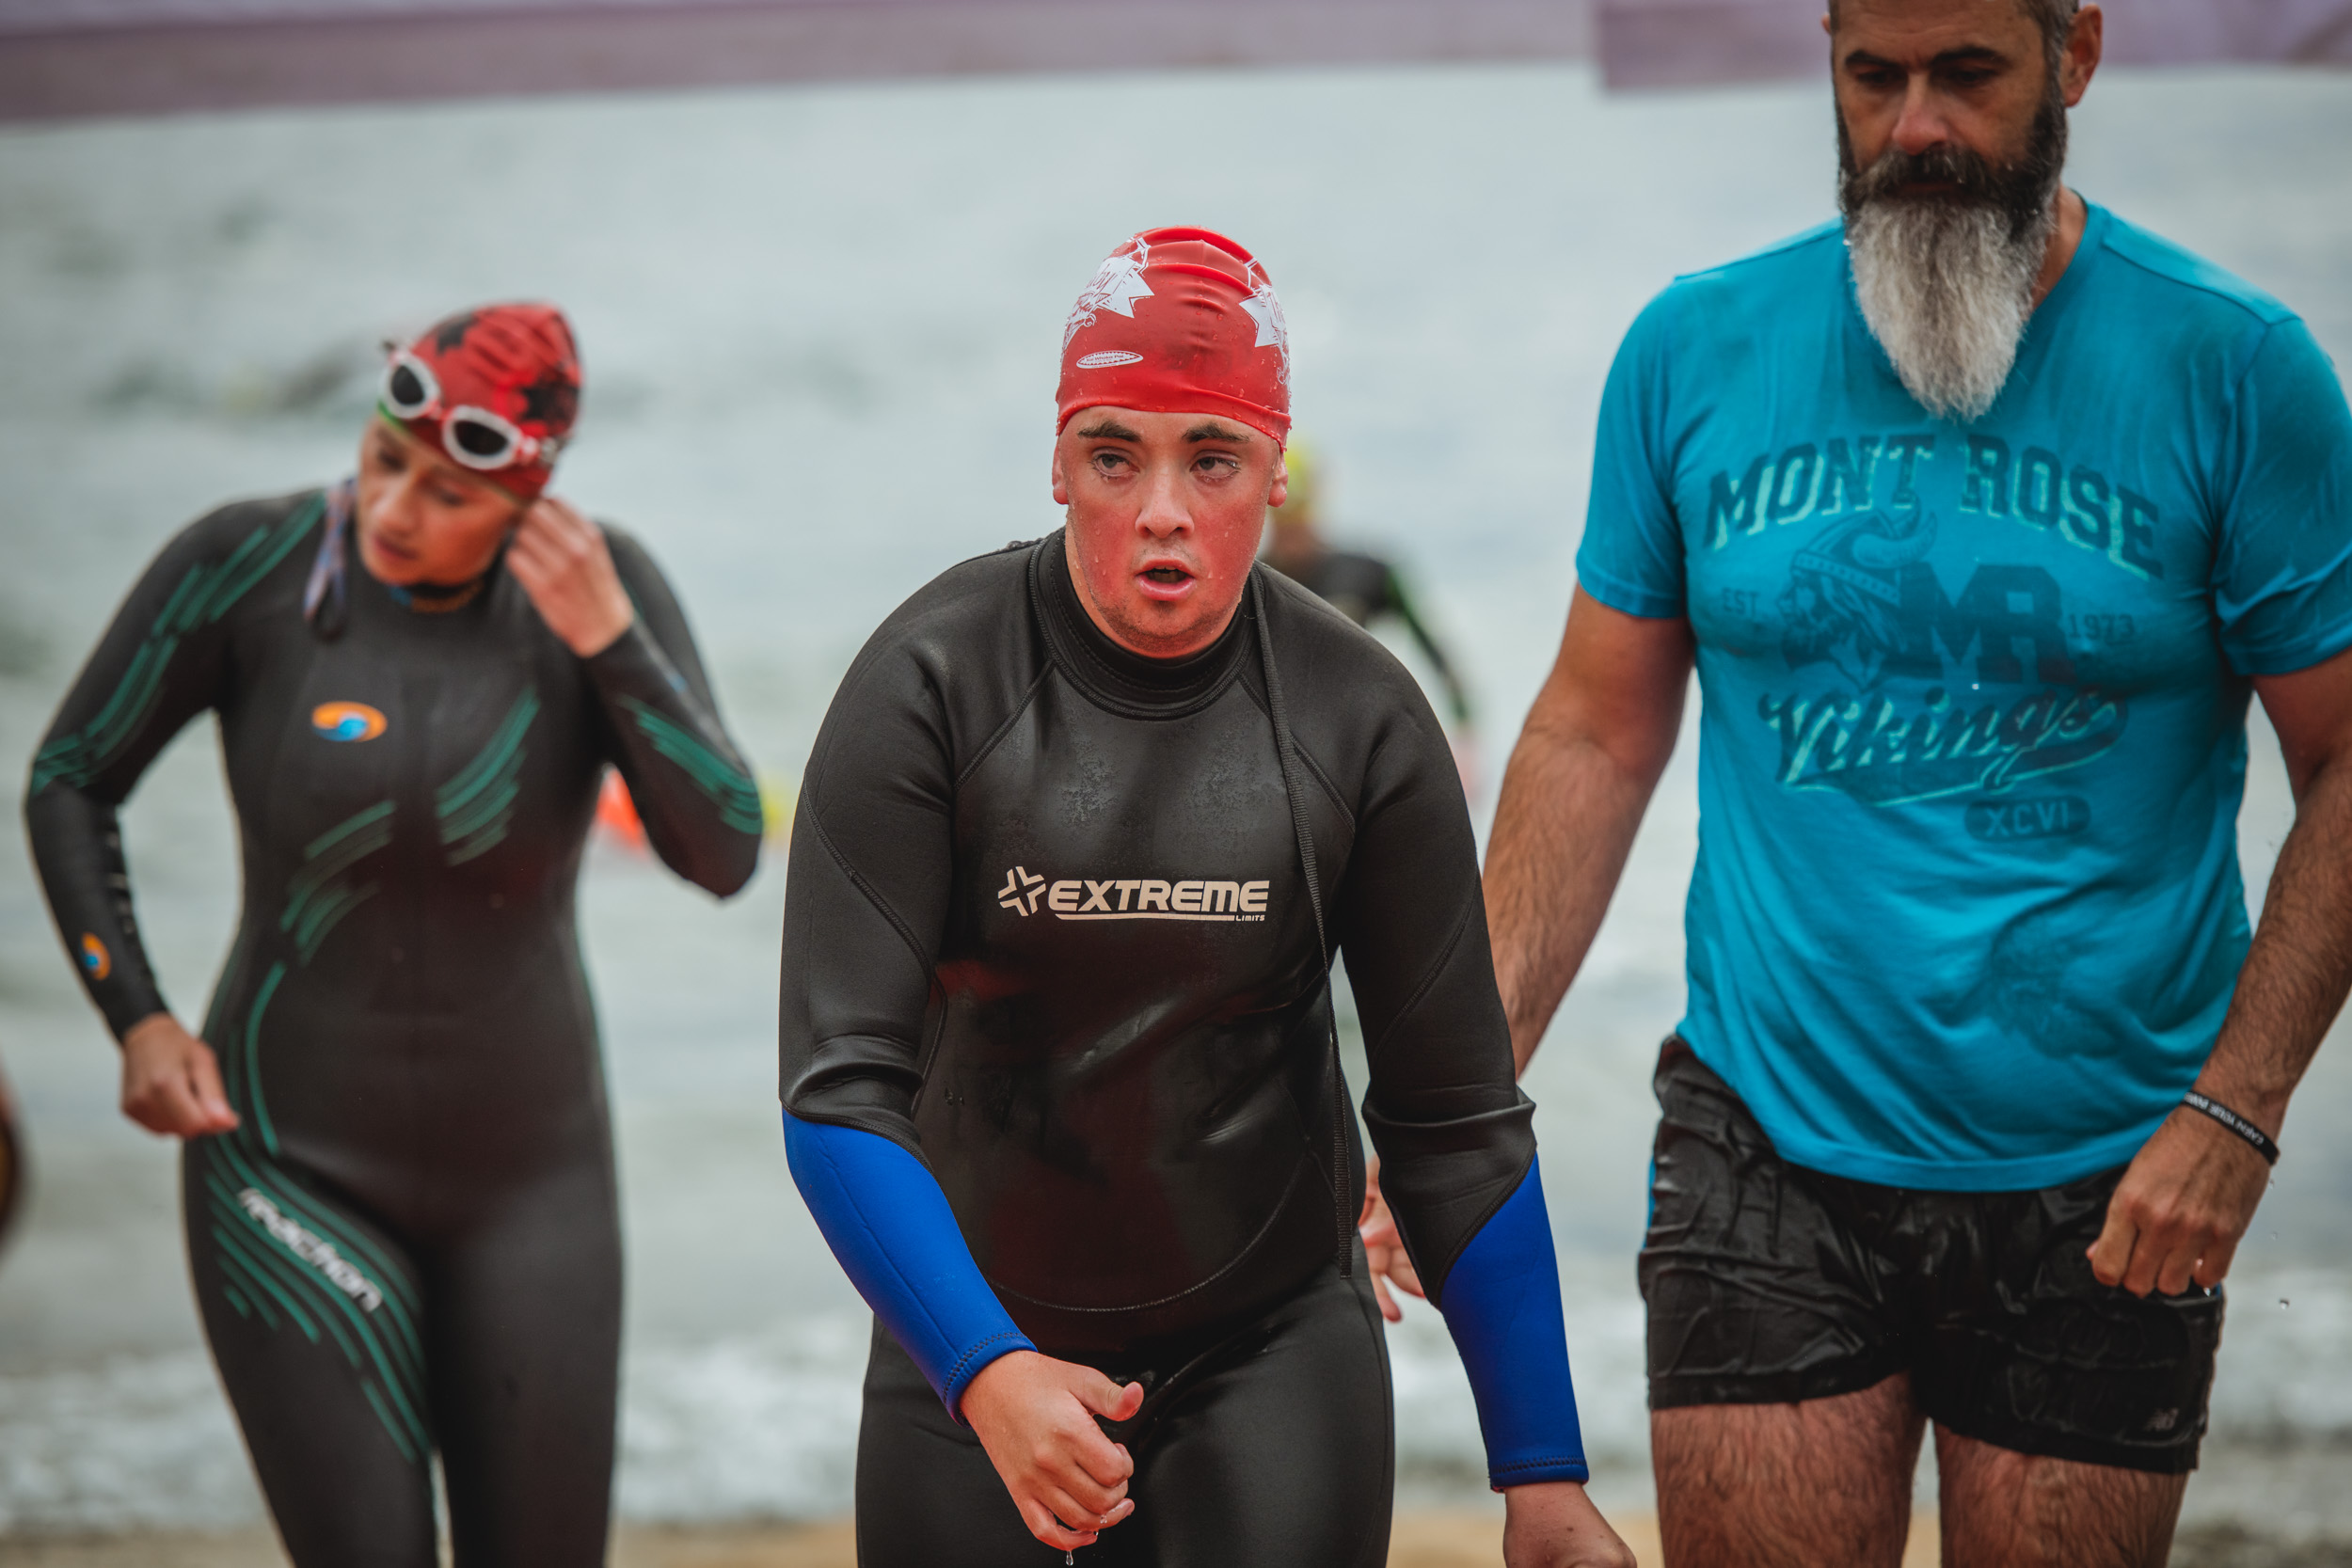 Scotty Emerging from Lake Wanaka